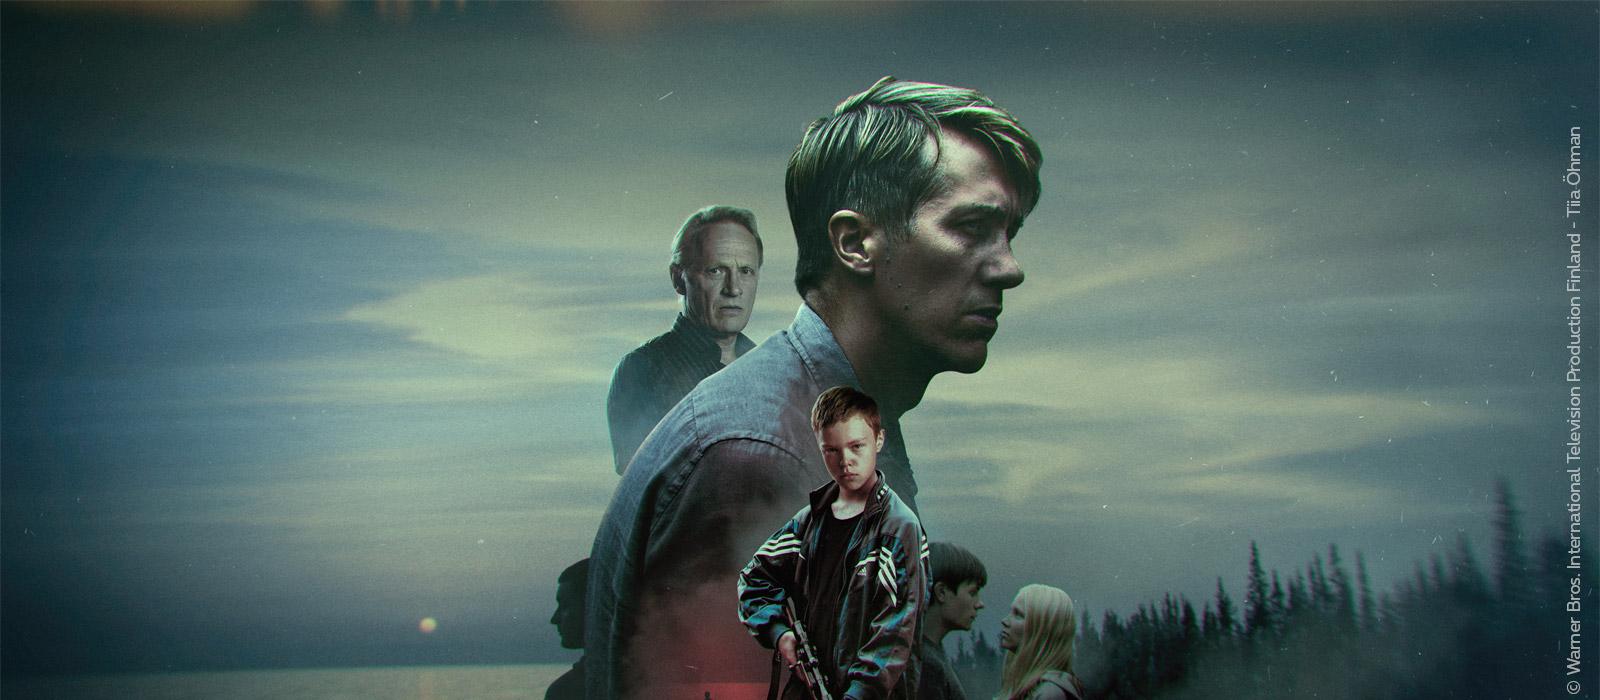 Man in Room 301 in Movies & Series